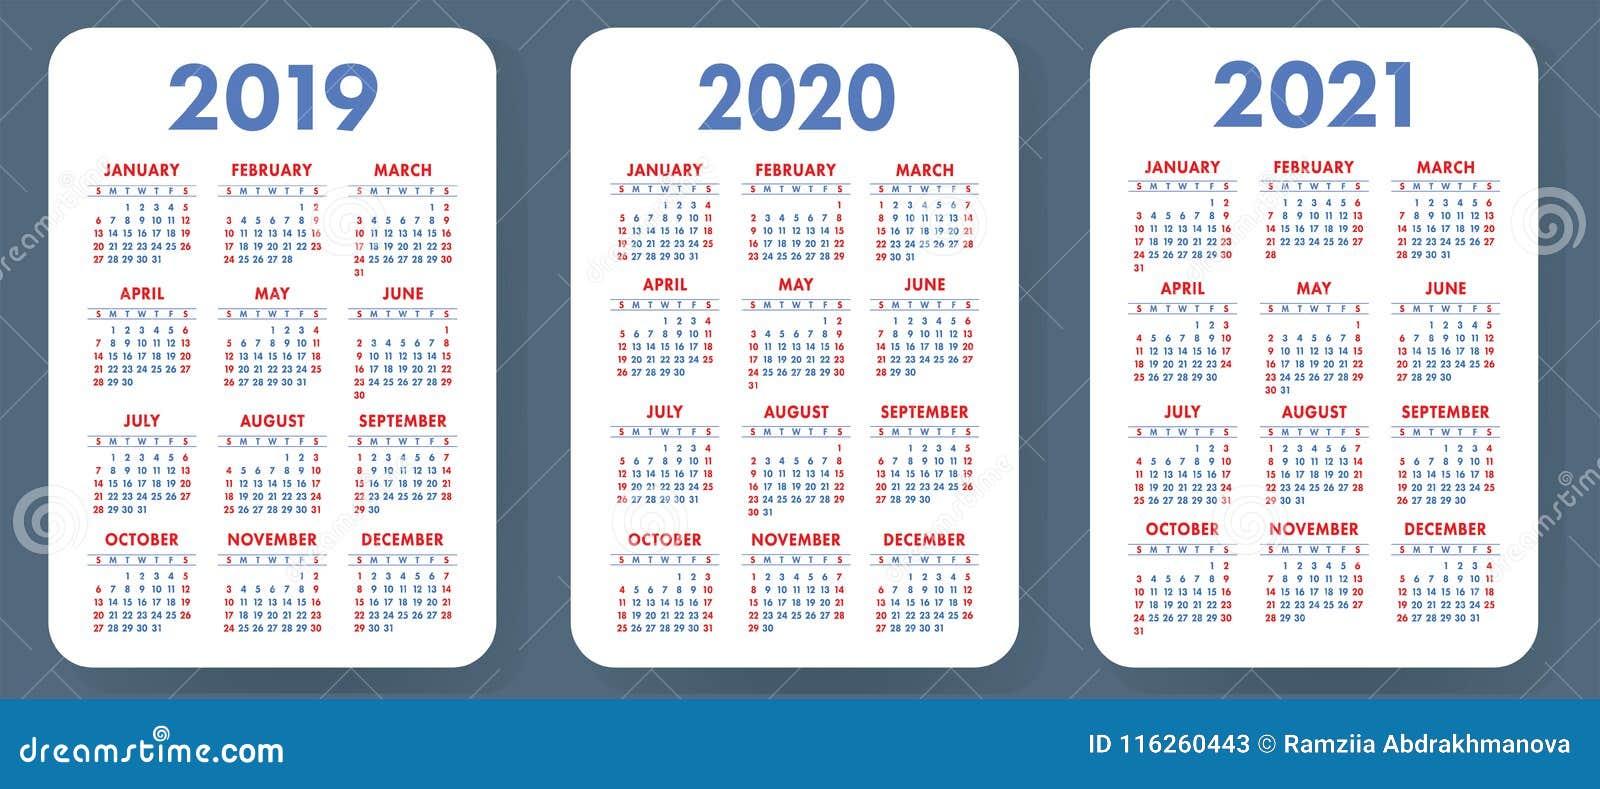 Calendrier De Poche 2019.Calendrier 2019 2020 De Poche Ensemble 2021 Calibre Simple